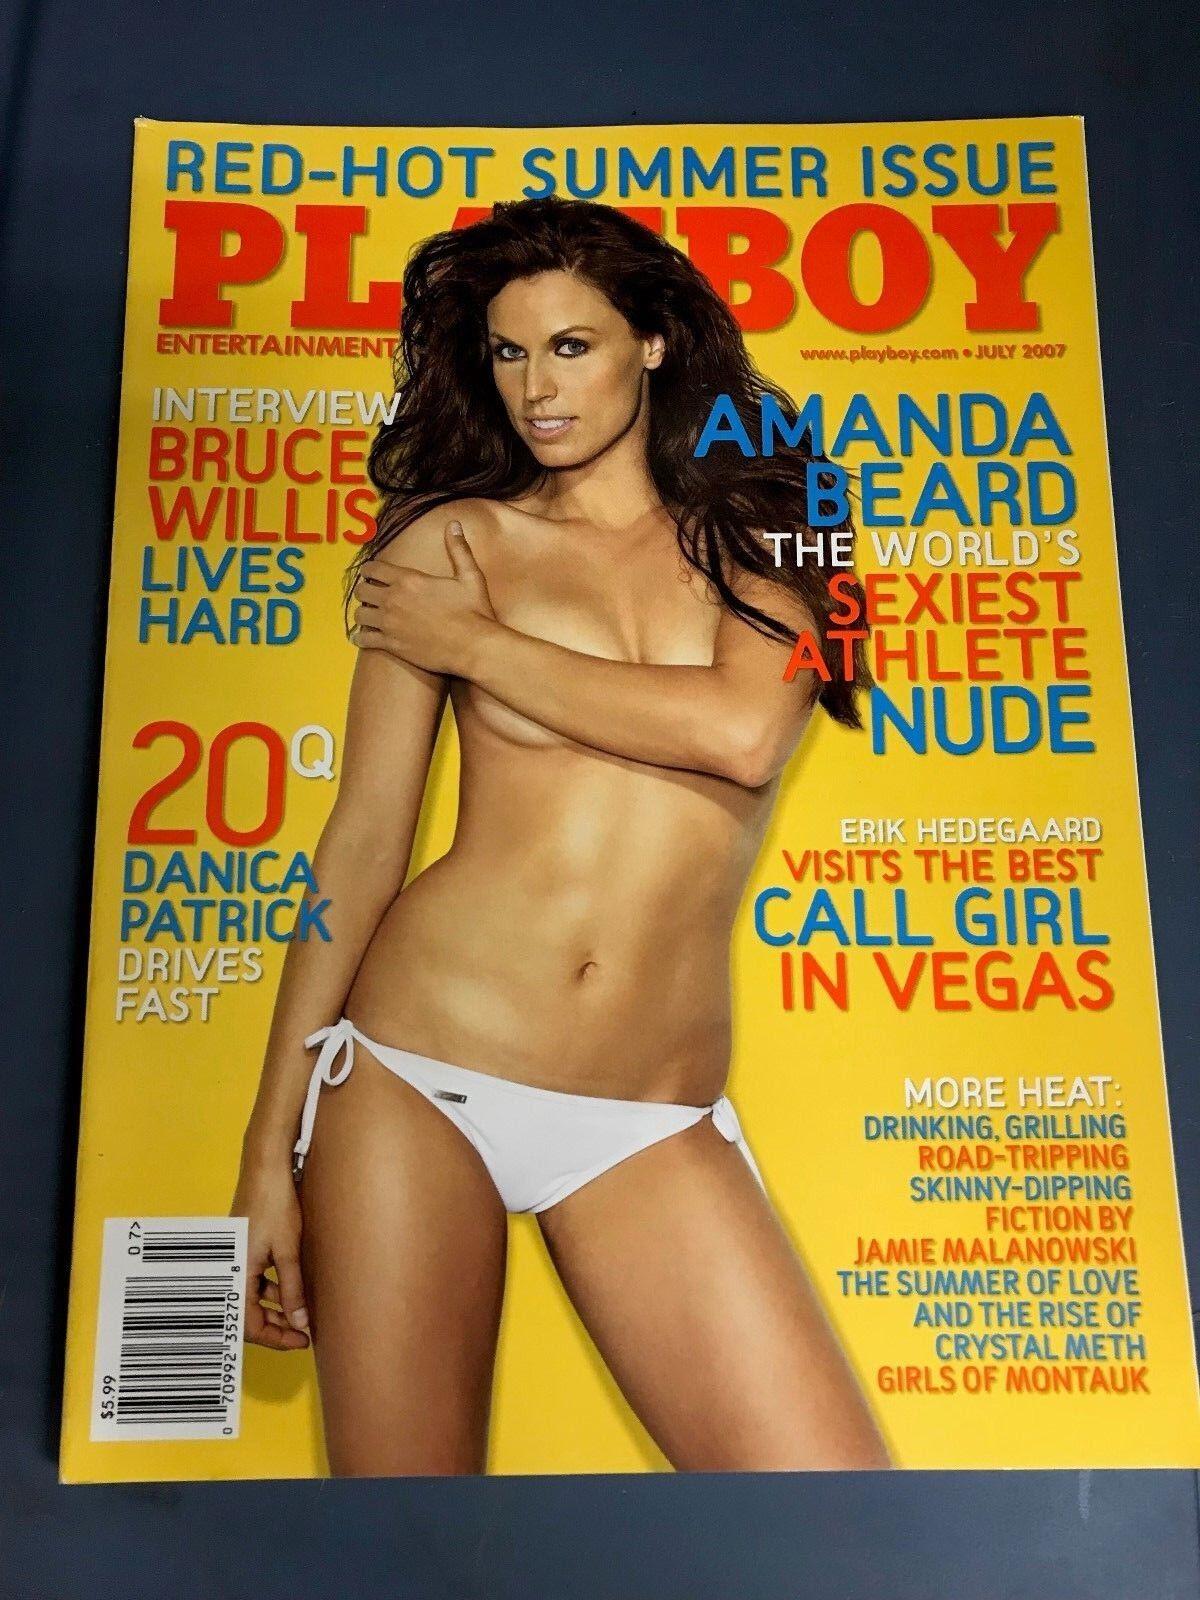 Amanda Beard Playboy Pics playboy magazine july 2007 amanda beard | ebay